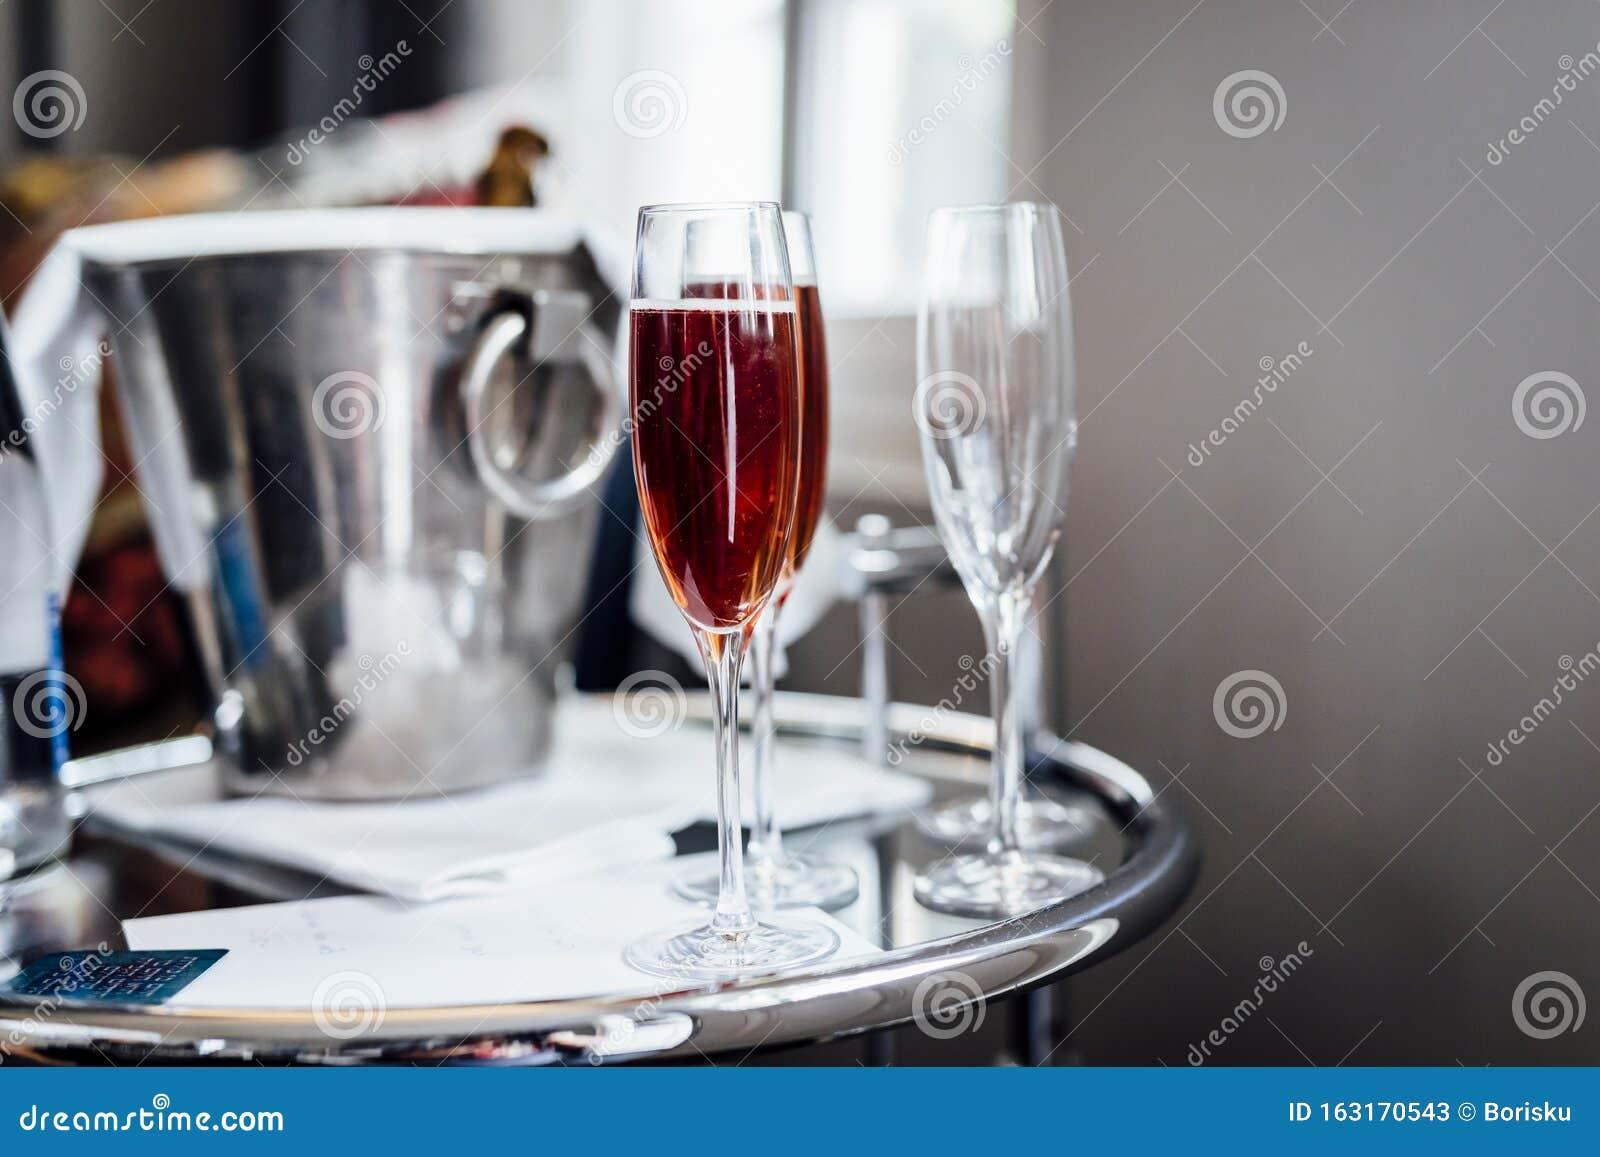 wine weddings social events alcohol gourmet